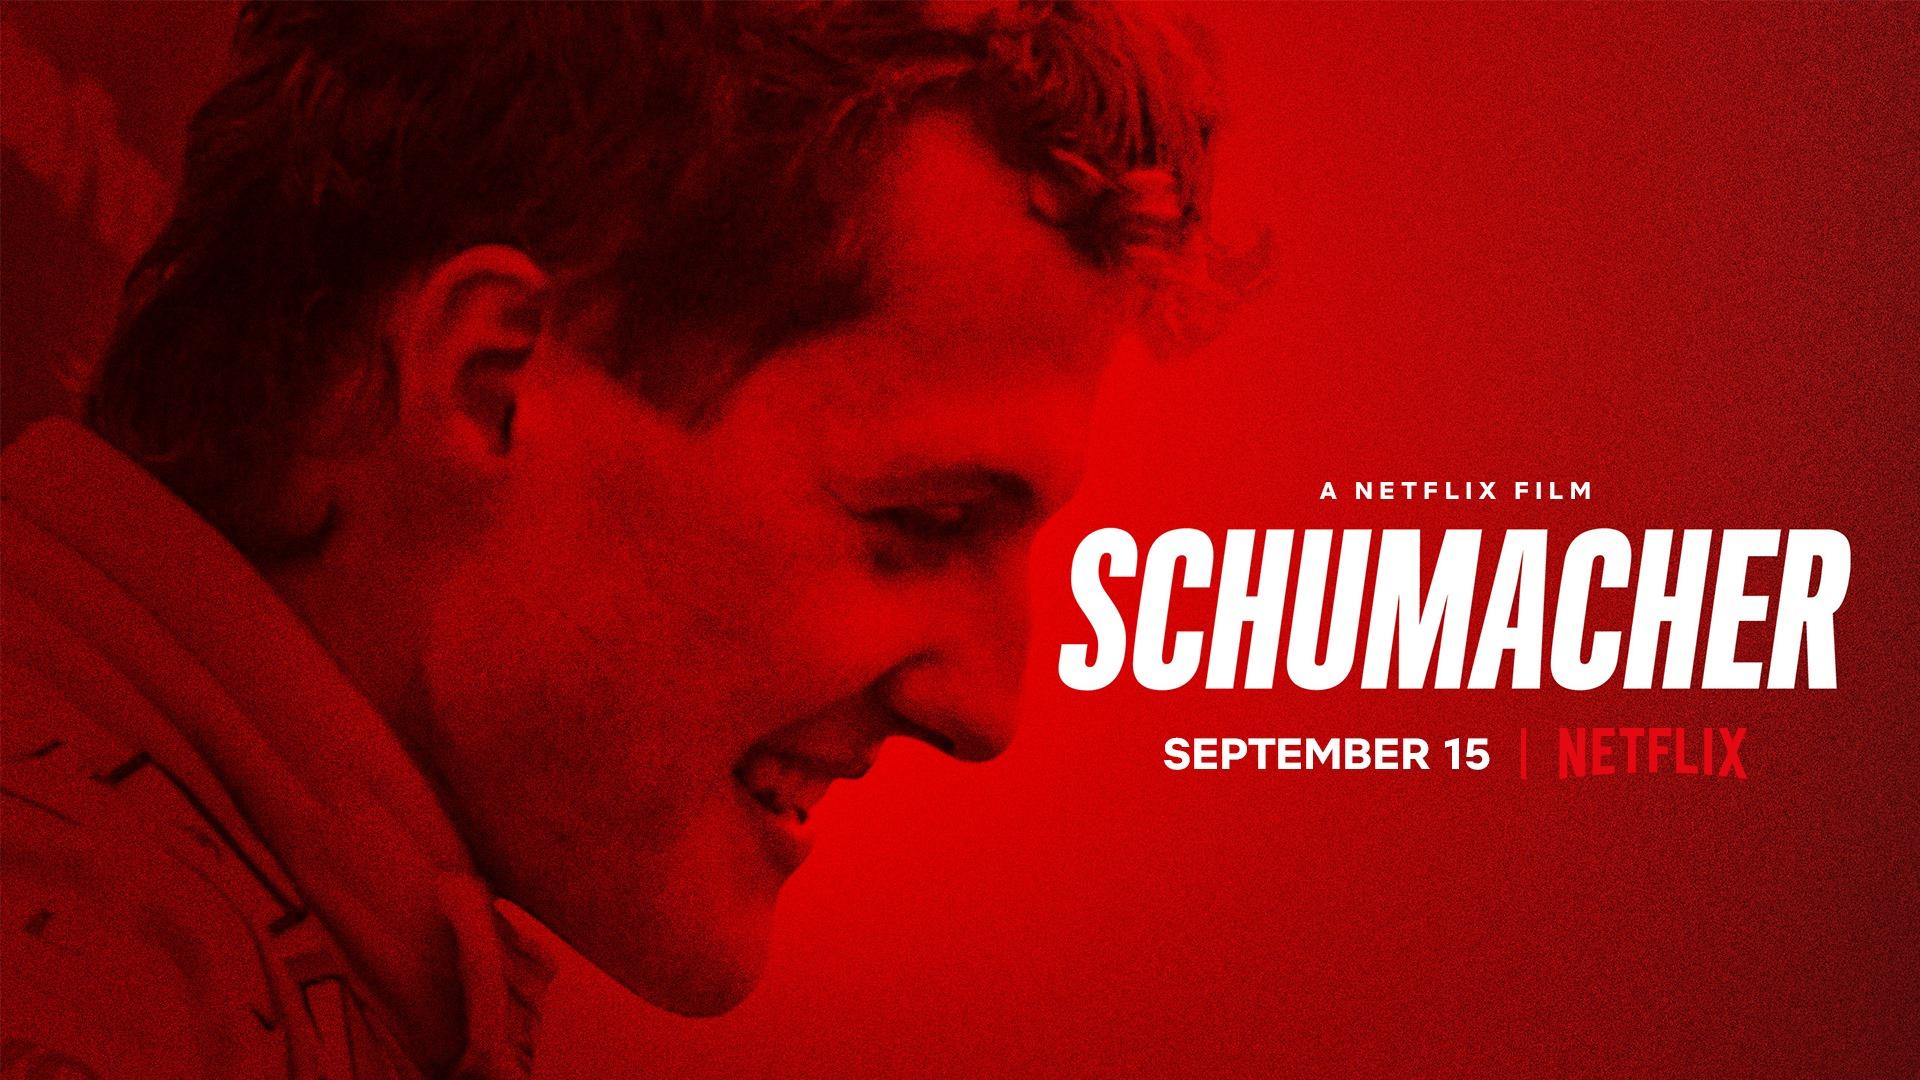 Netflix: Πρώτη γεύση από το ντοκιμαντέρ για τον Michael Schumacher (video)